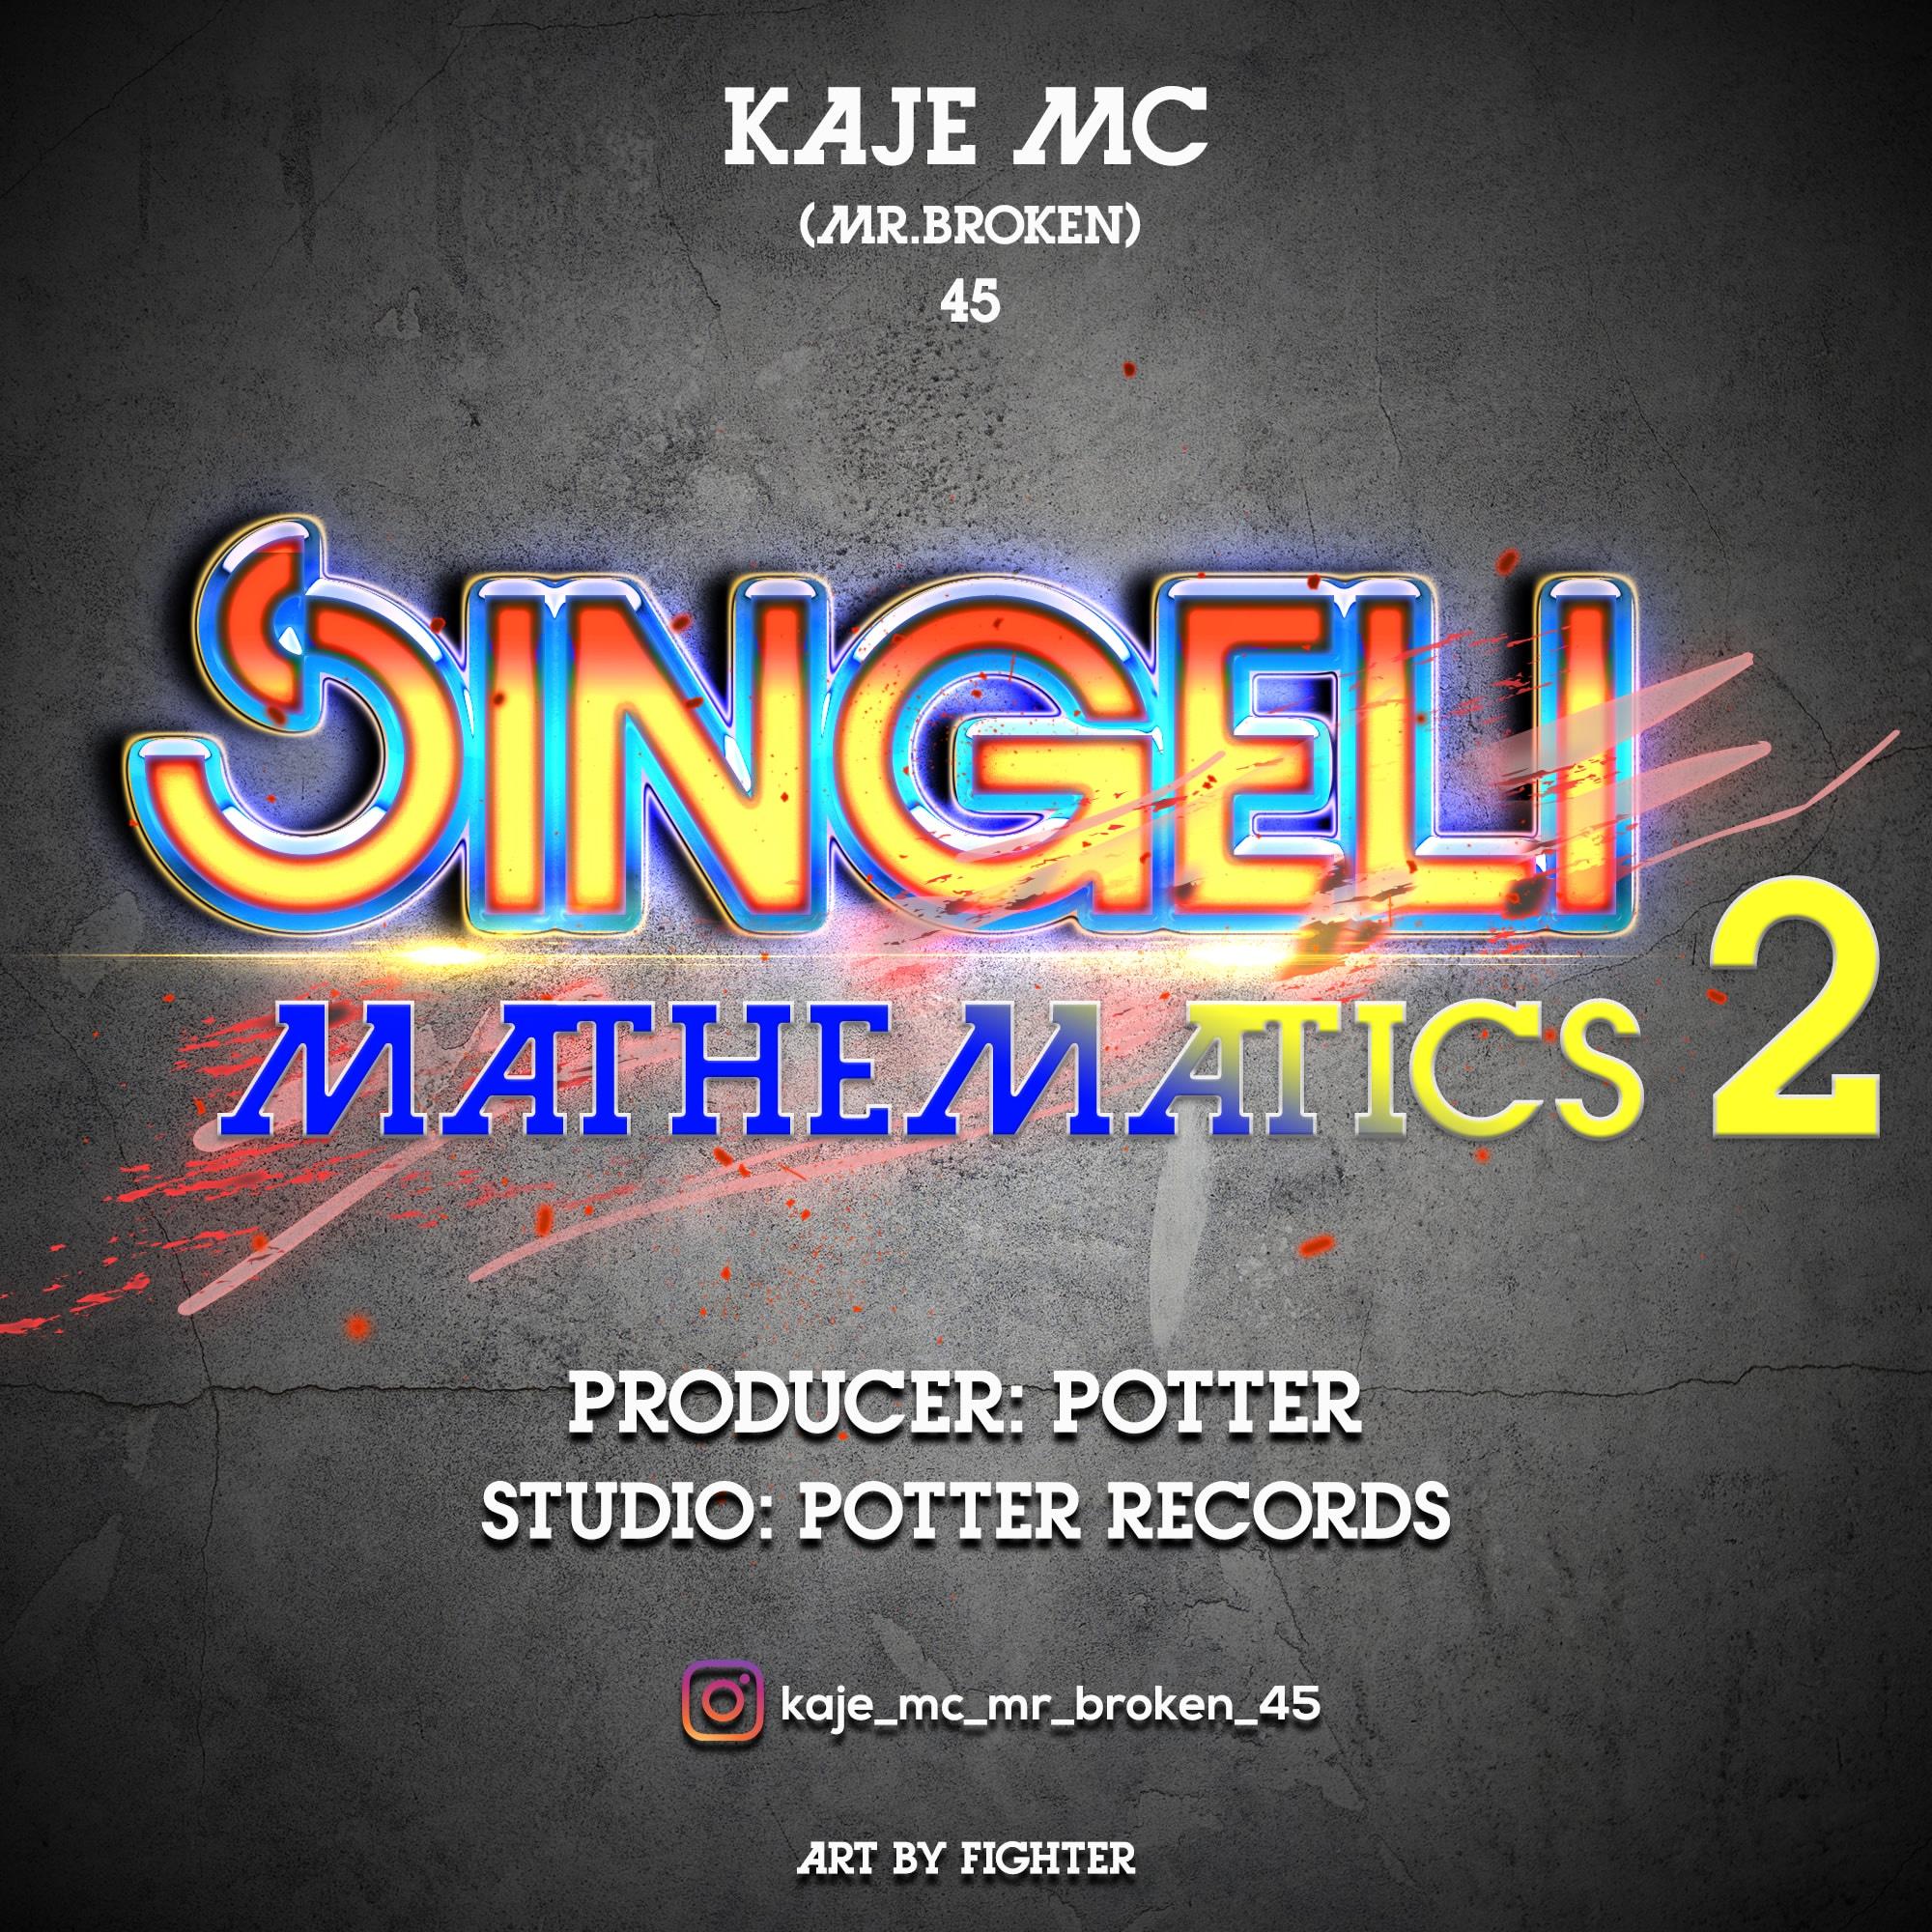 AUDIO l Kaje Double Killer (Mr Broken) - Singeli Mathematics 02 l Download